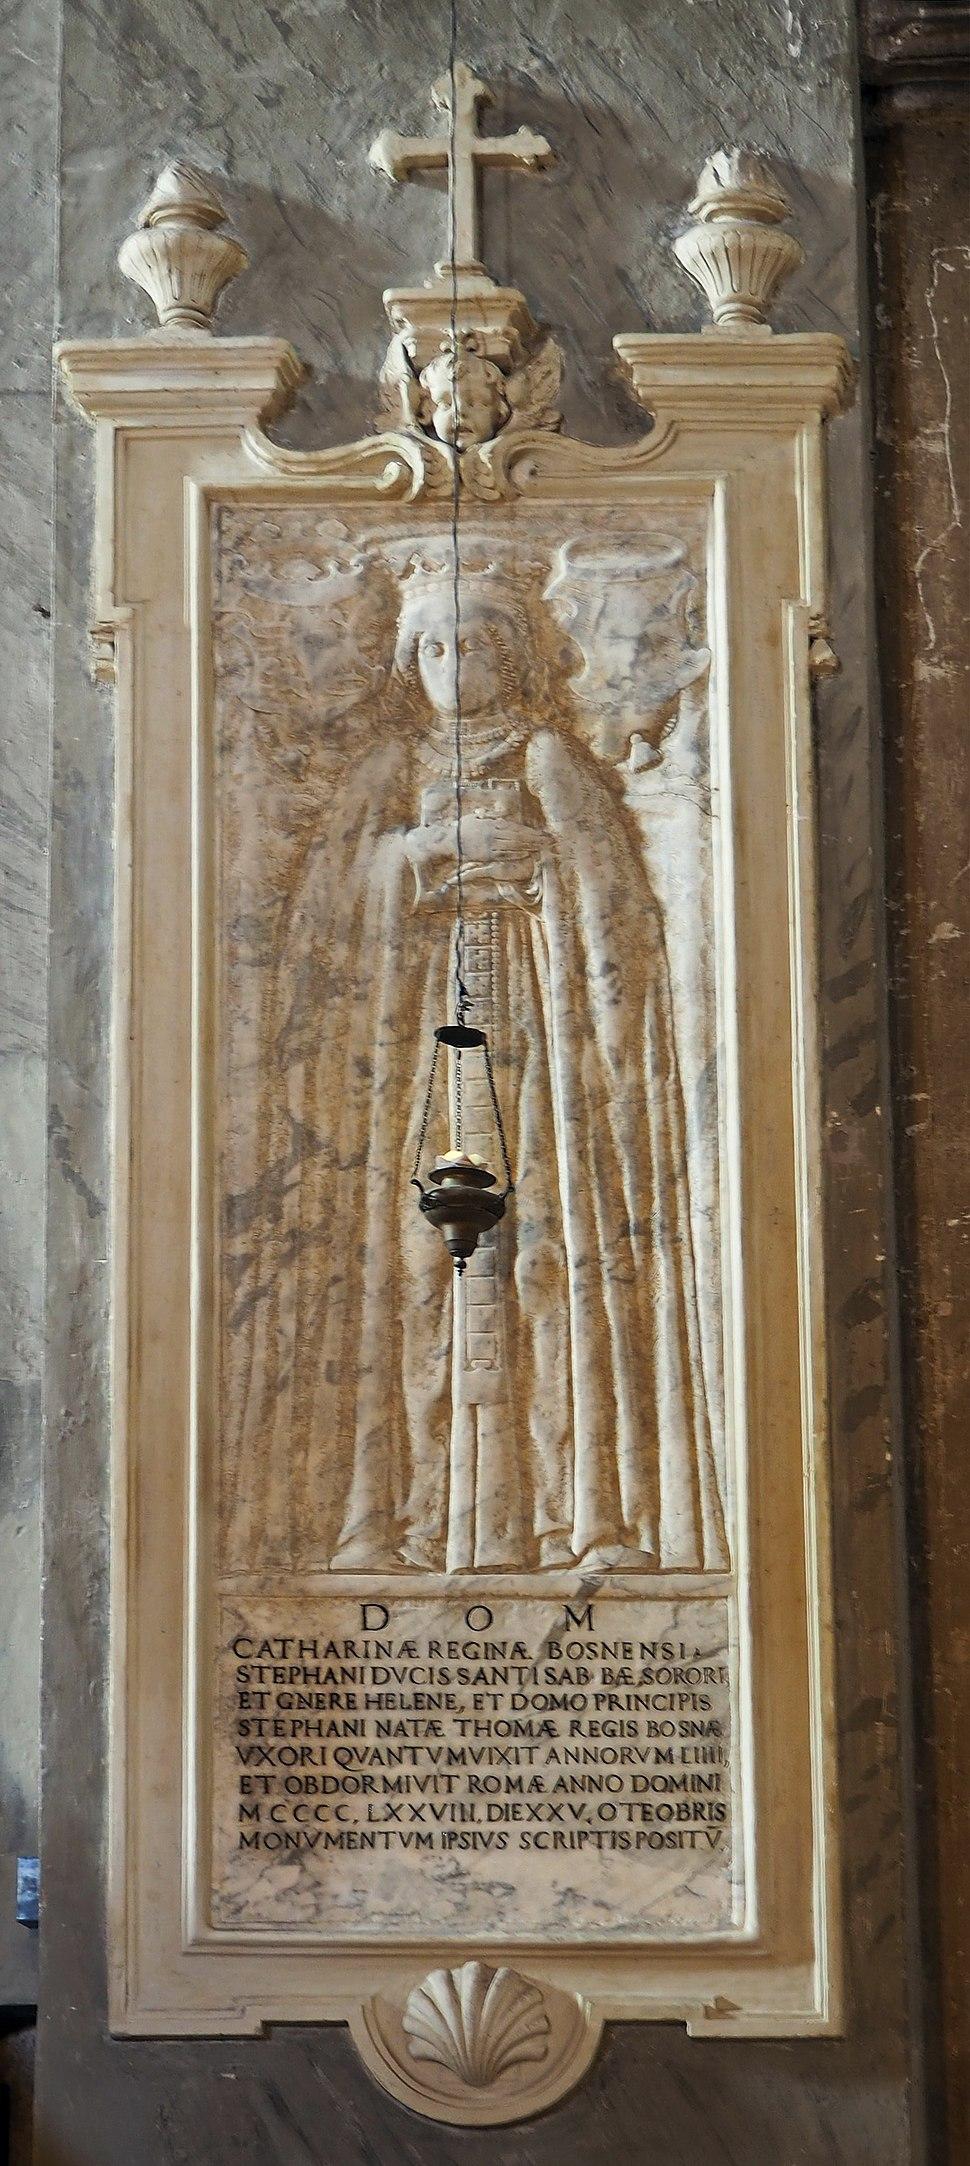 Santa Maria in Aracoeli Grabmal der Königin Katarina von Bosnien